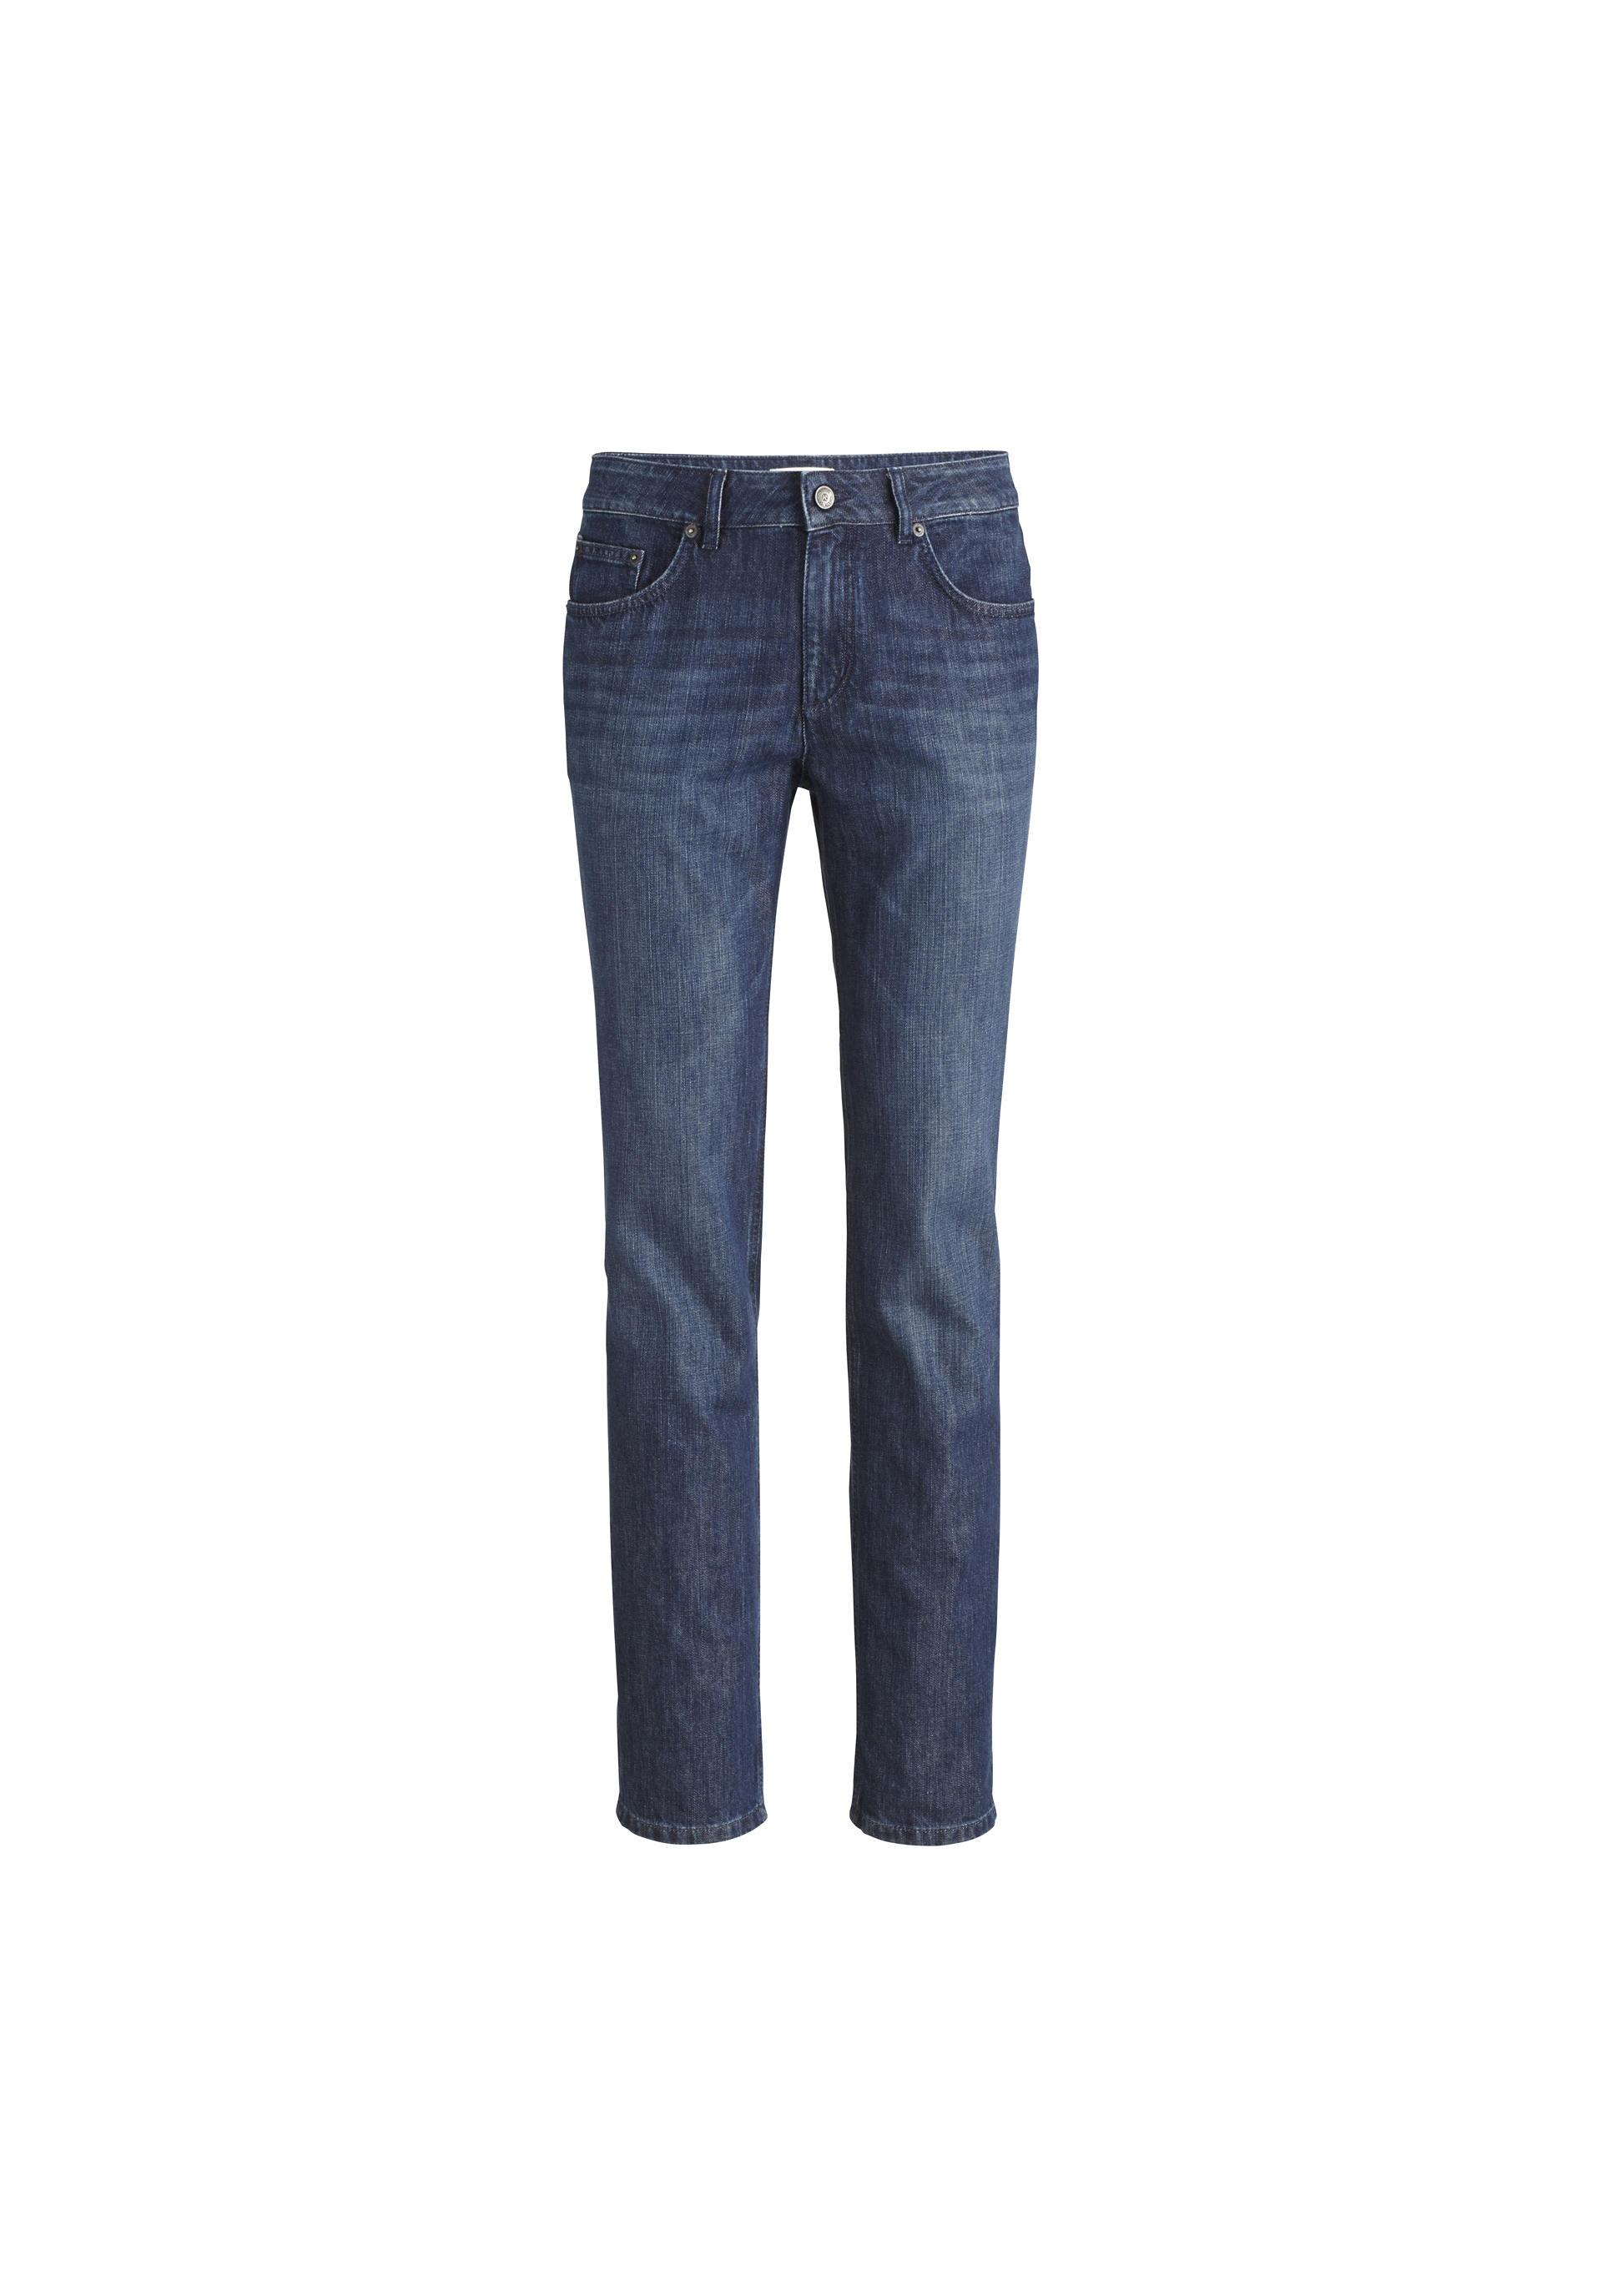 herren jeans straight fit aus reinem bio denim hessnatur. Black Bedroom Furniture Sets. Home Design Ideas